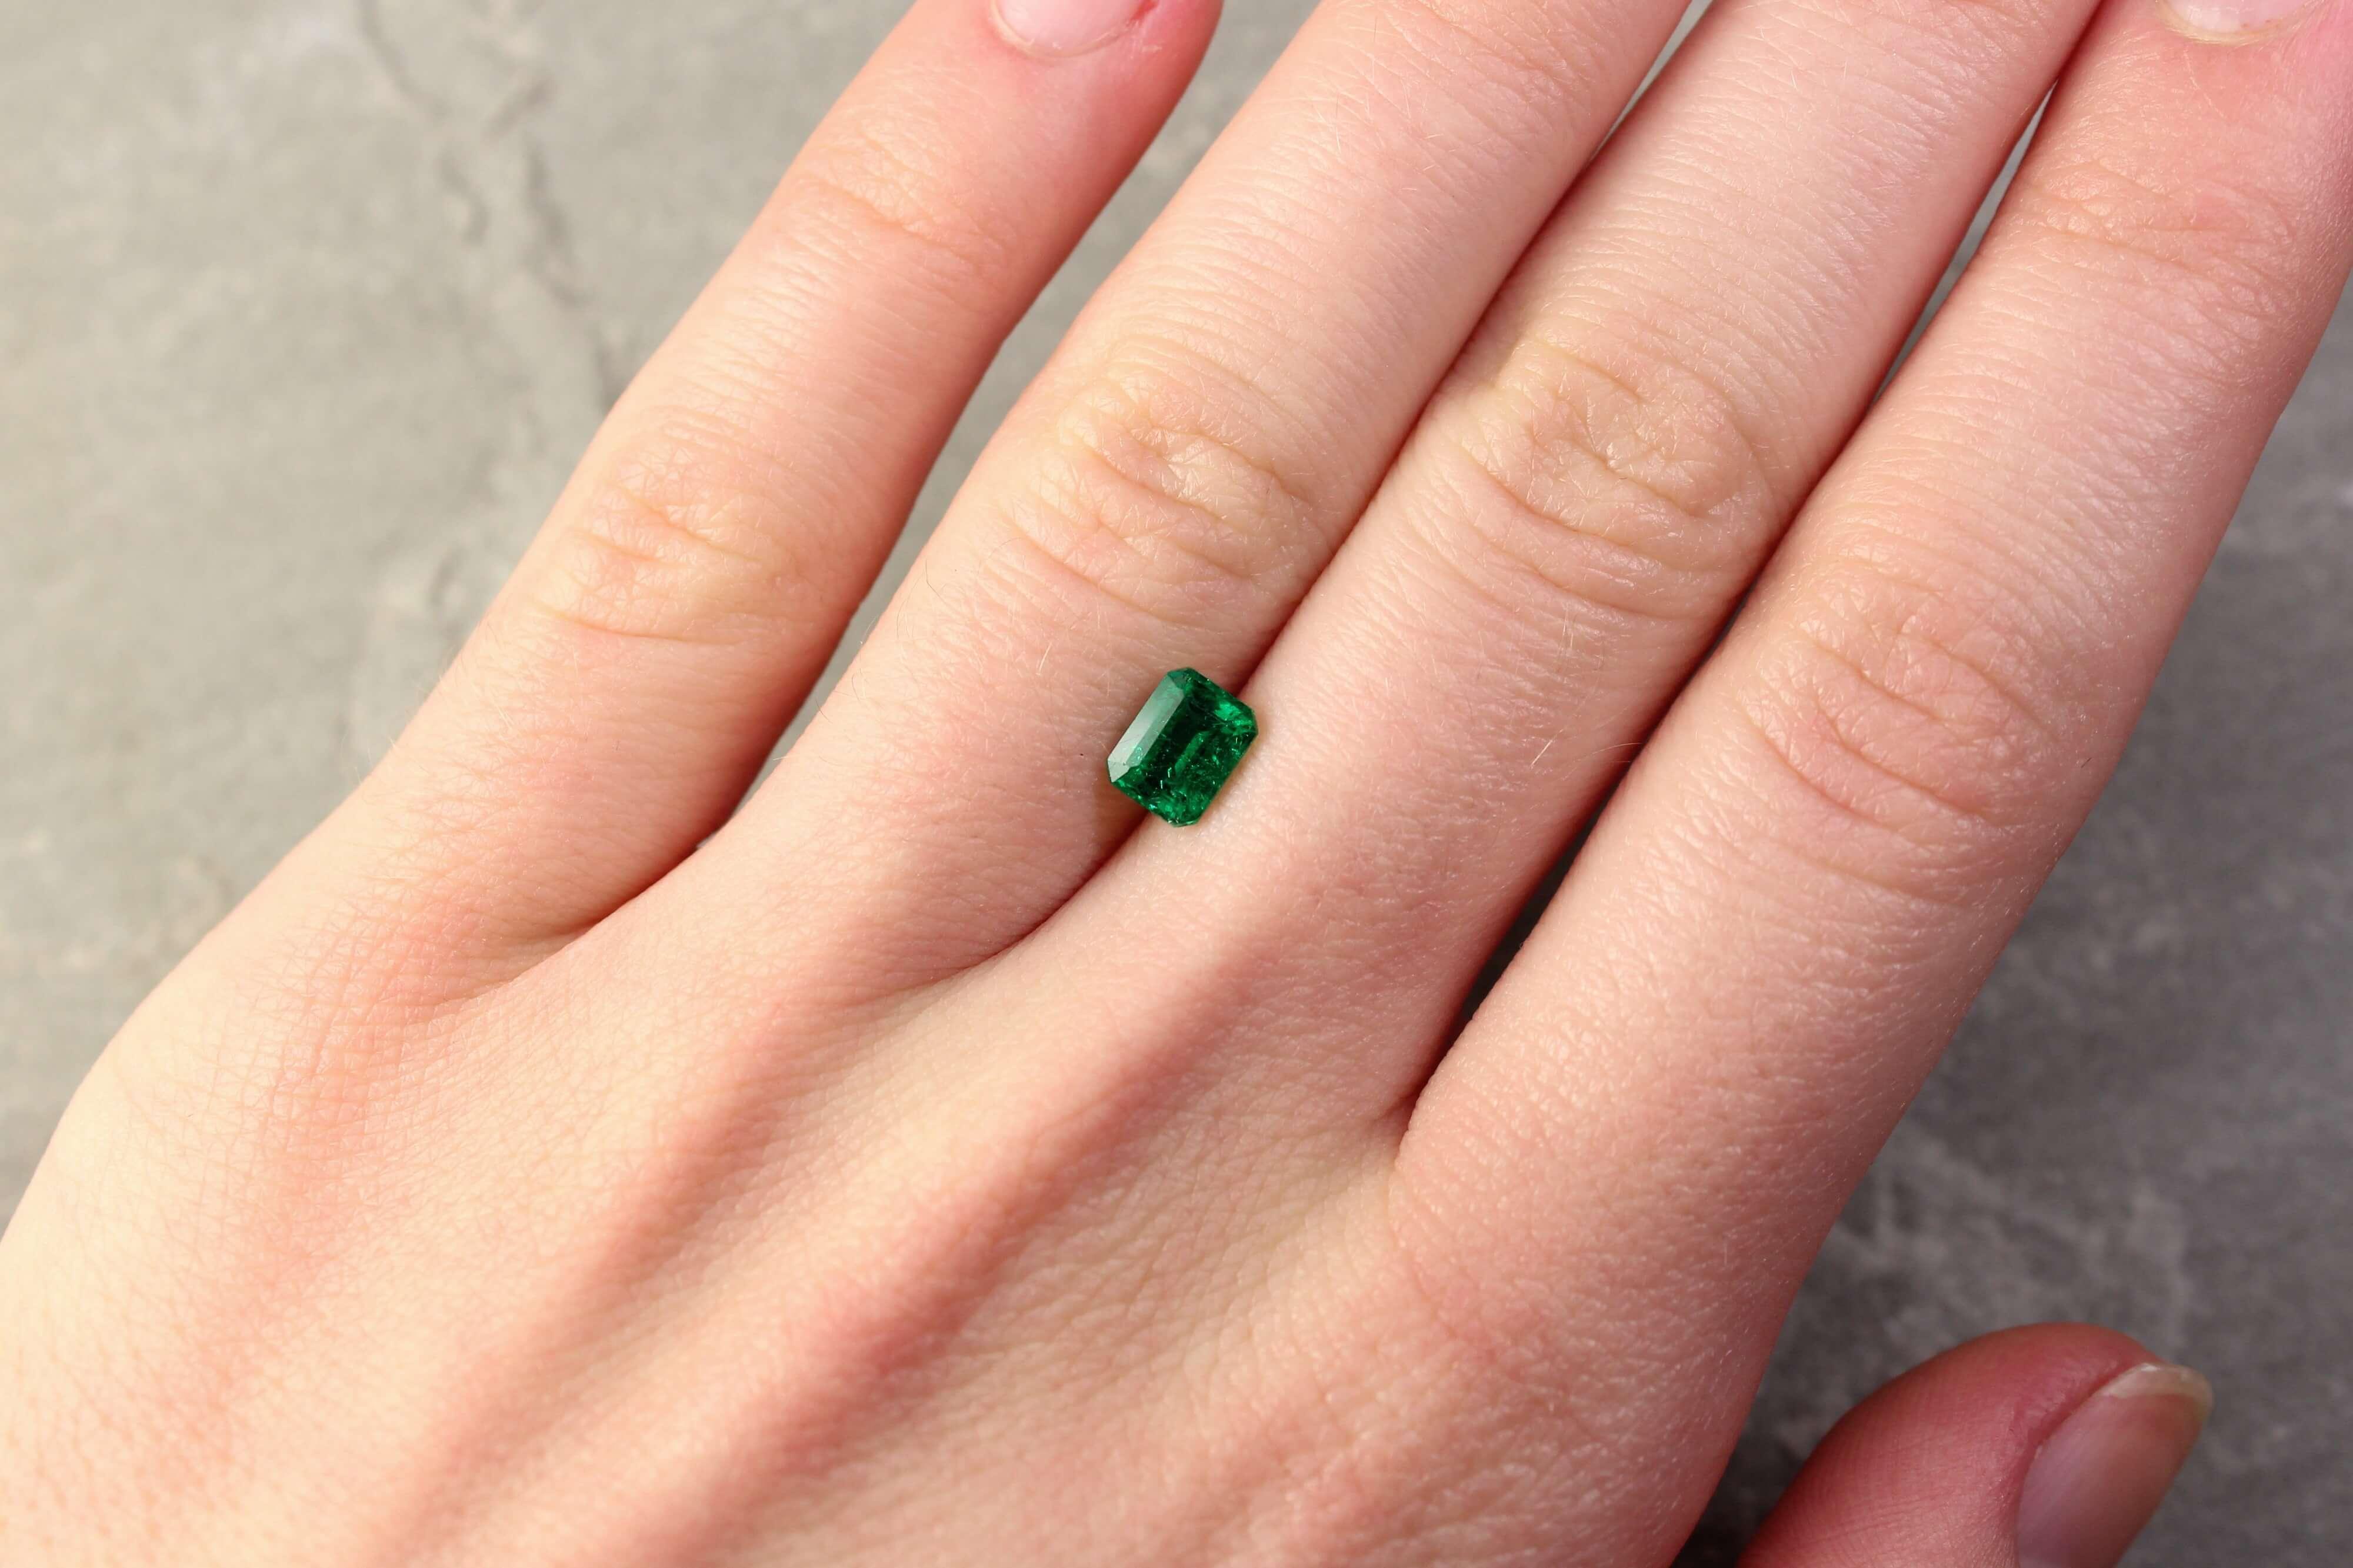 0.87 ct emerald cut green emerald